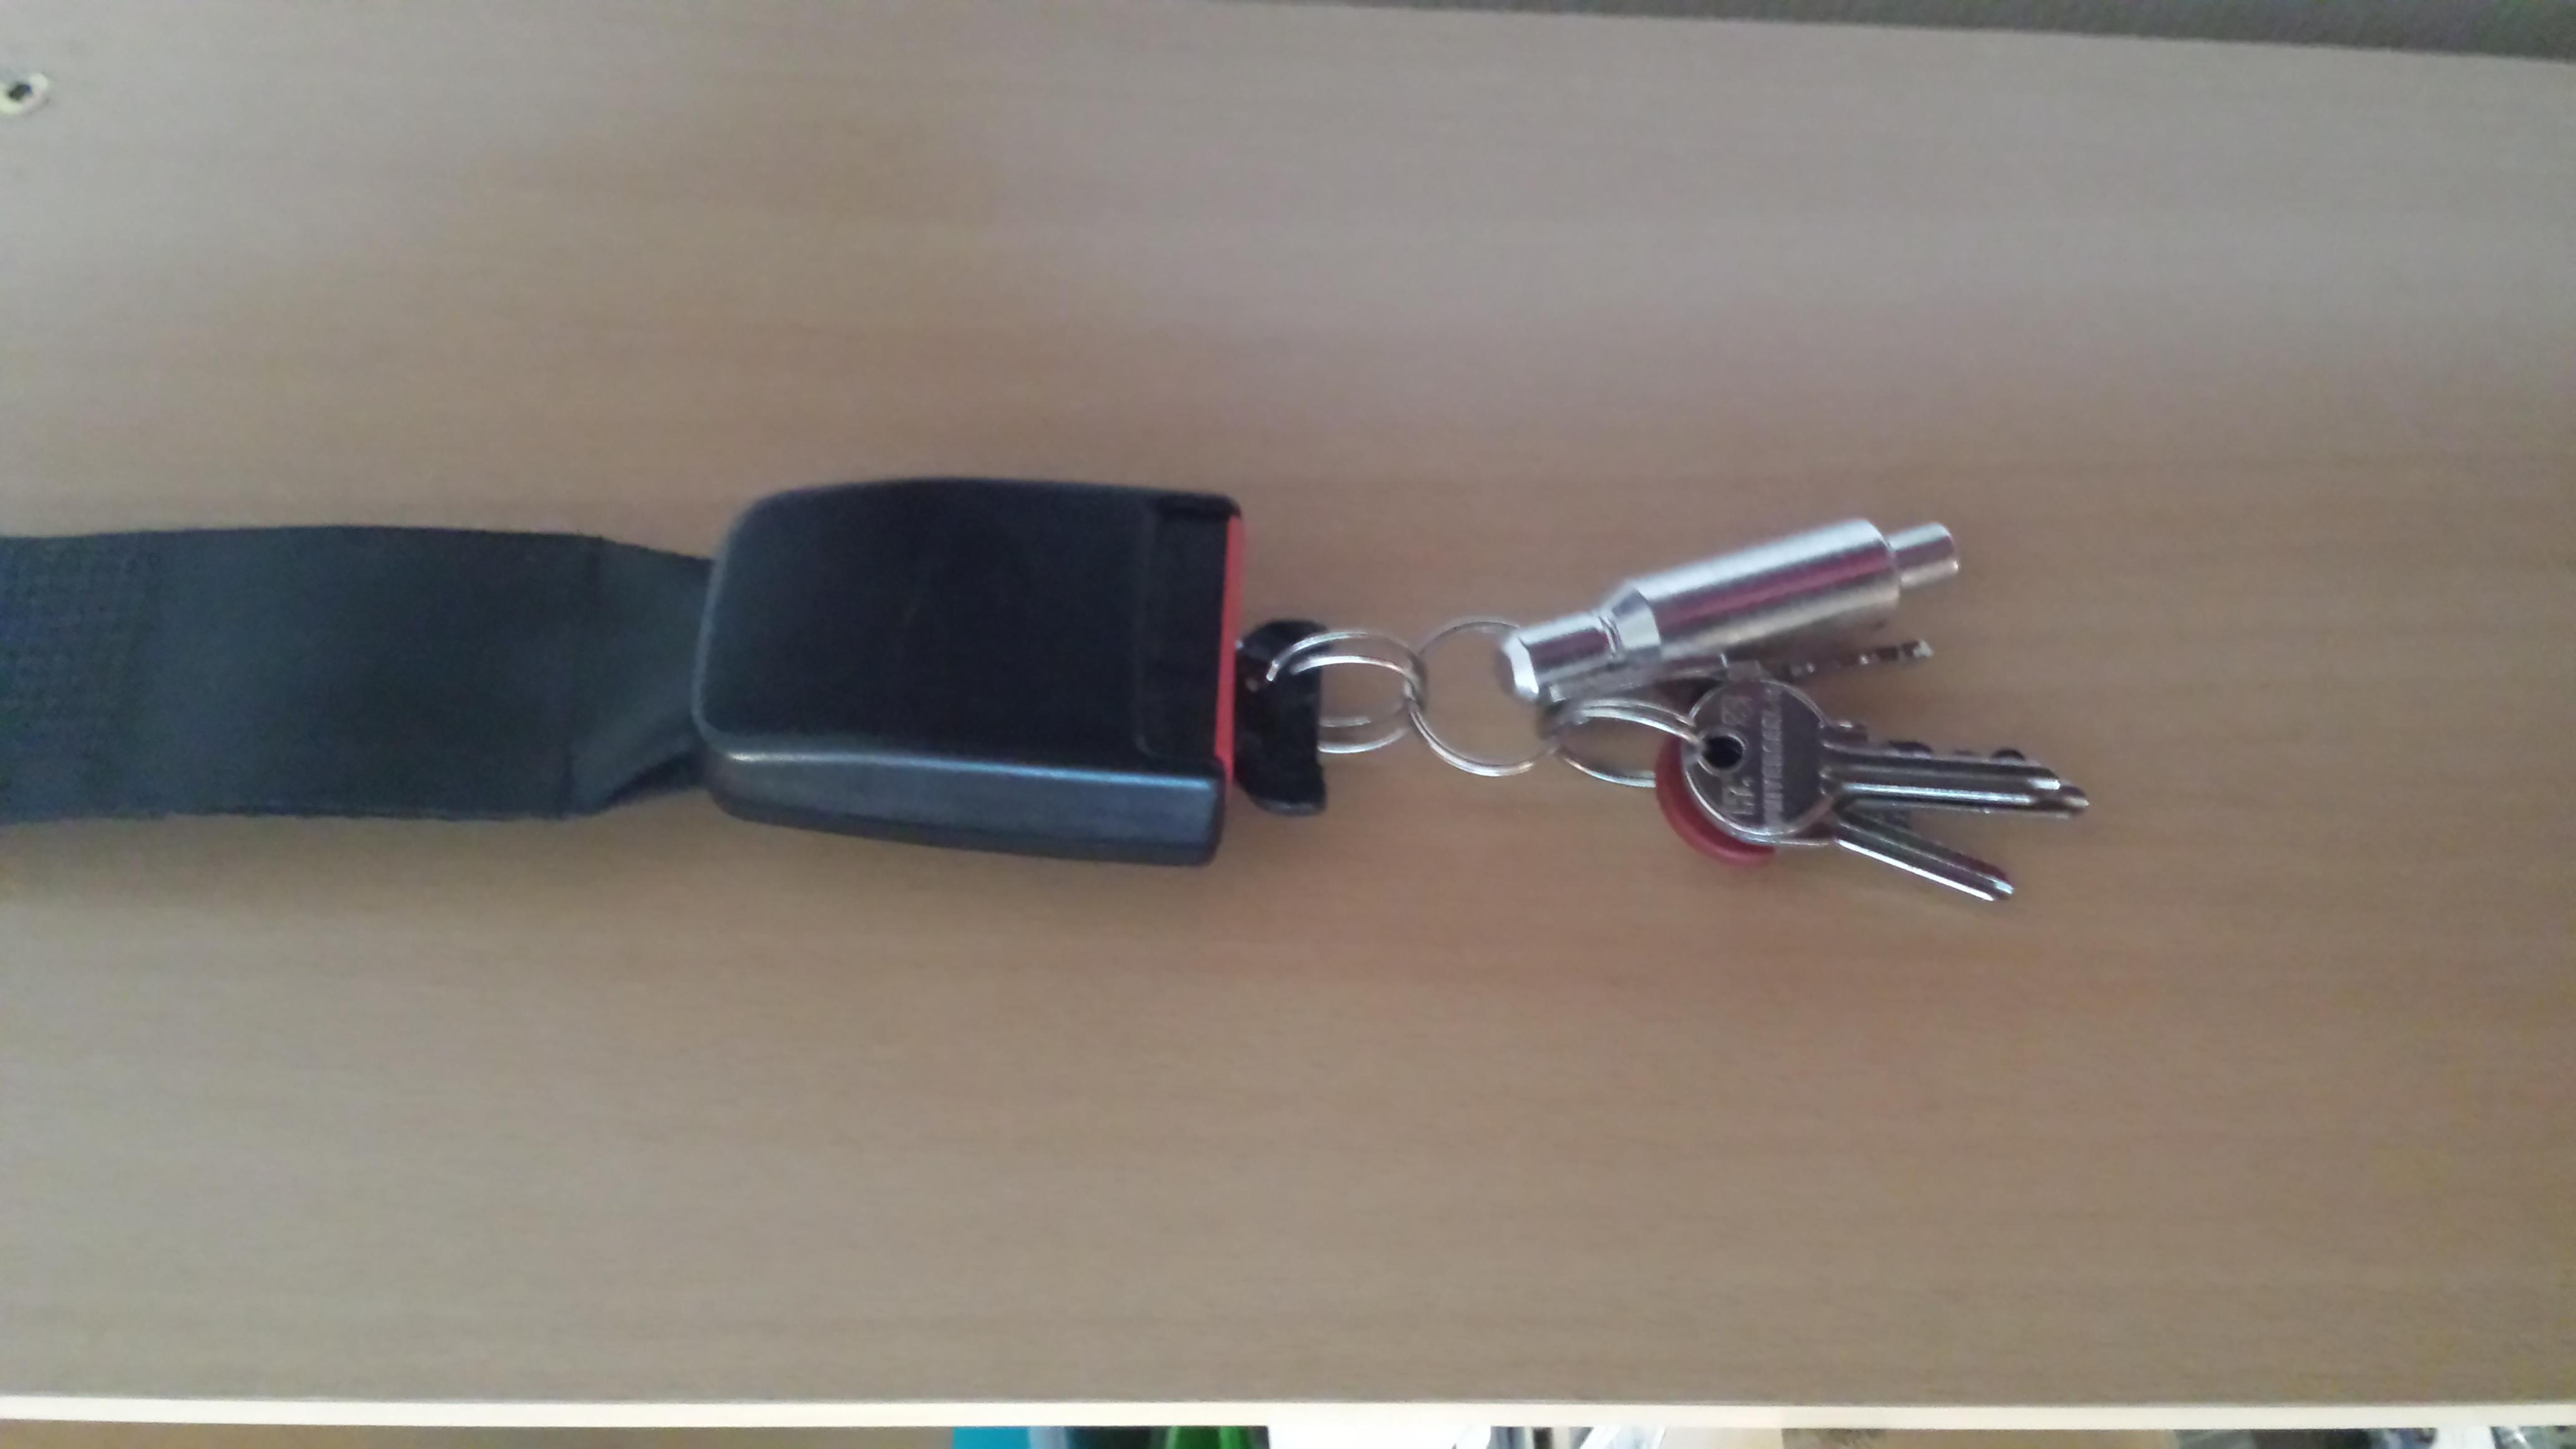 Seatbelt key organizer